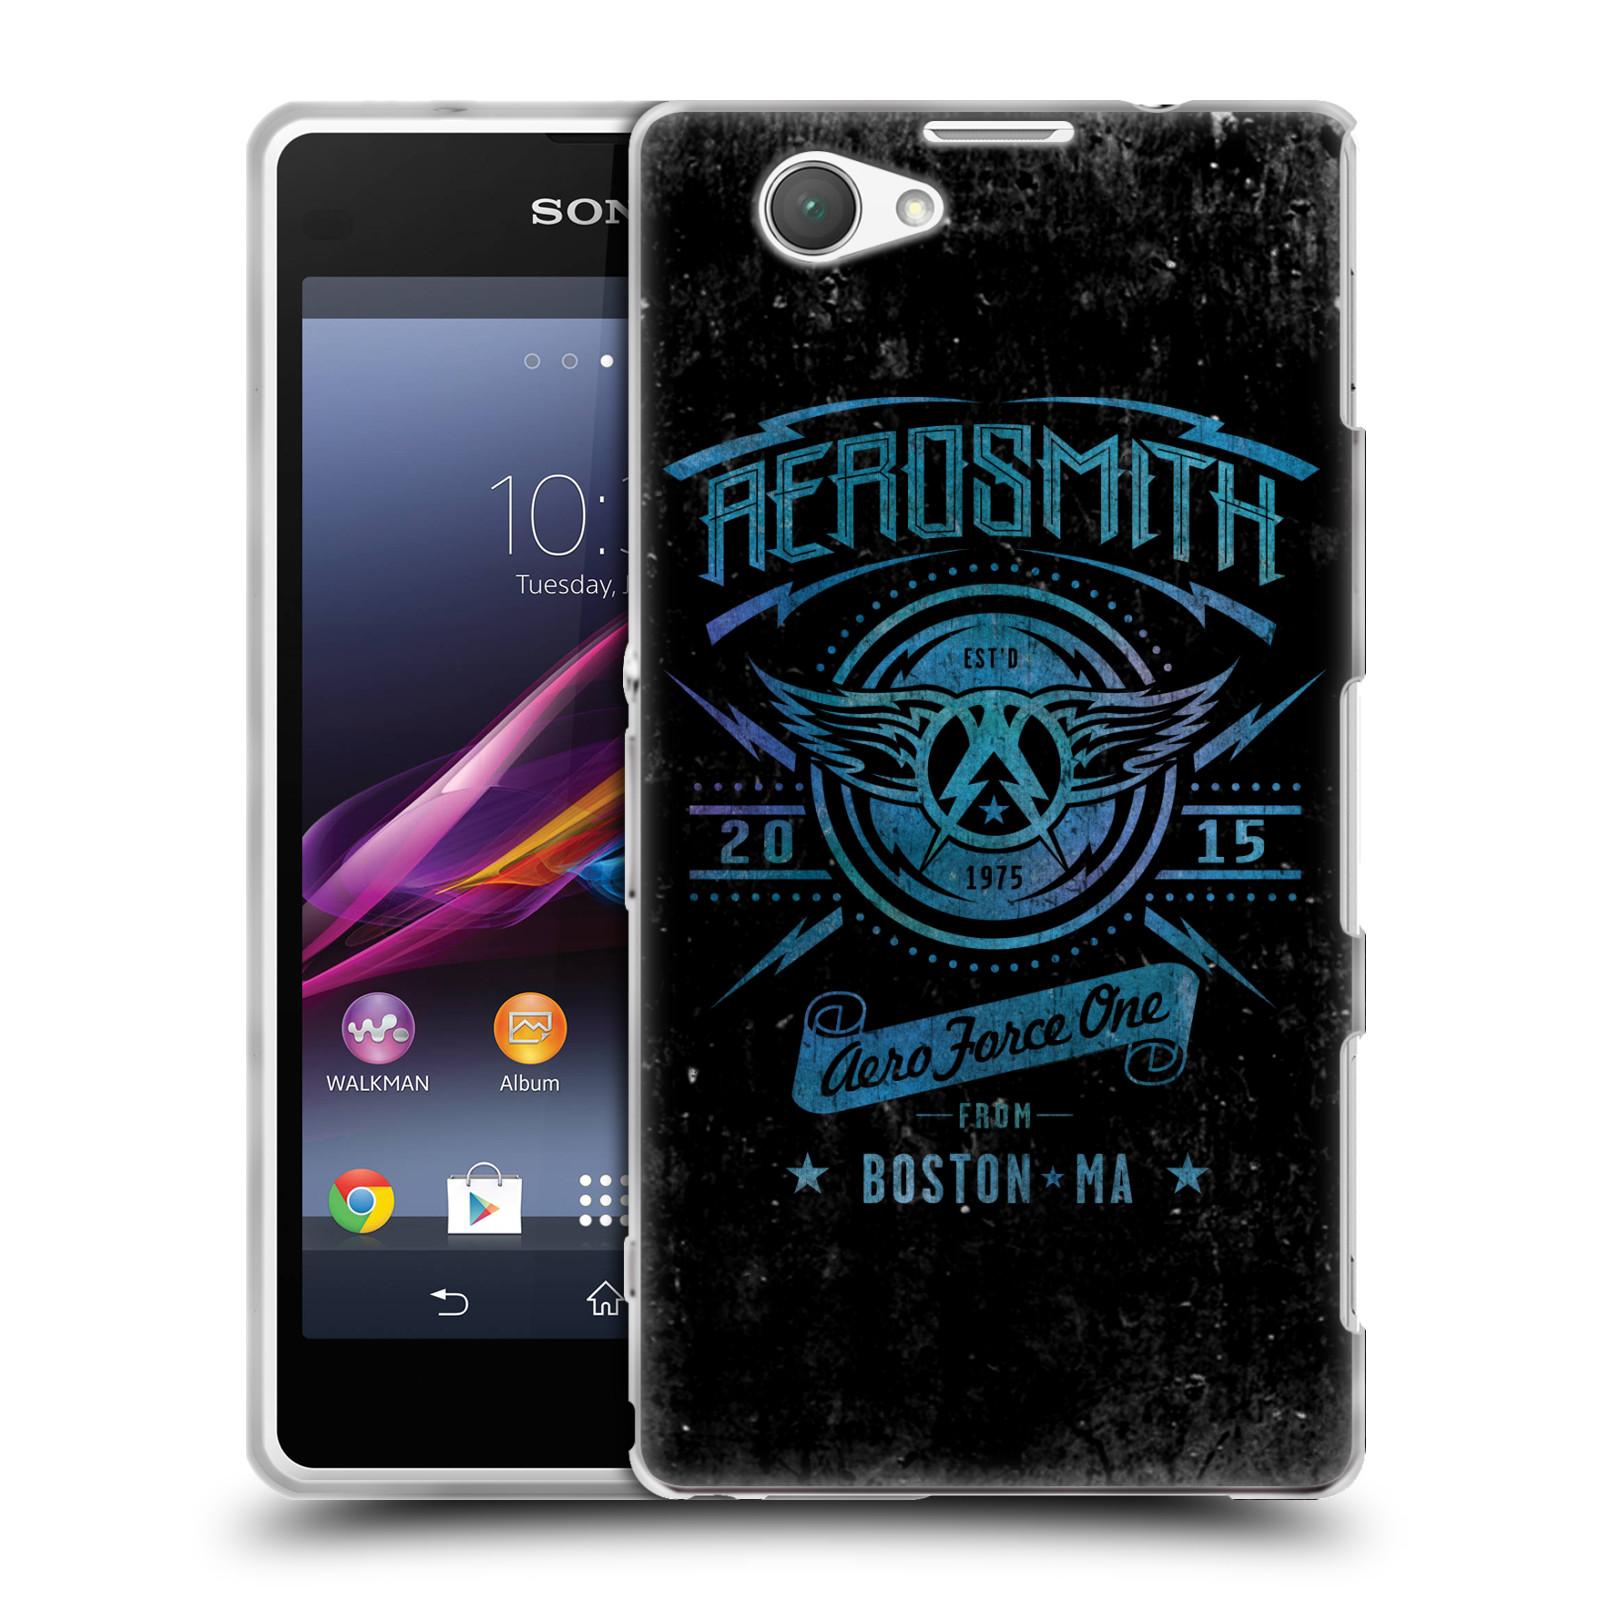 Silikonové pouzdro na mobil Sony Xperia Z1 Compact D5503 HEAD CASE - Aerosmith - Aero Force One